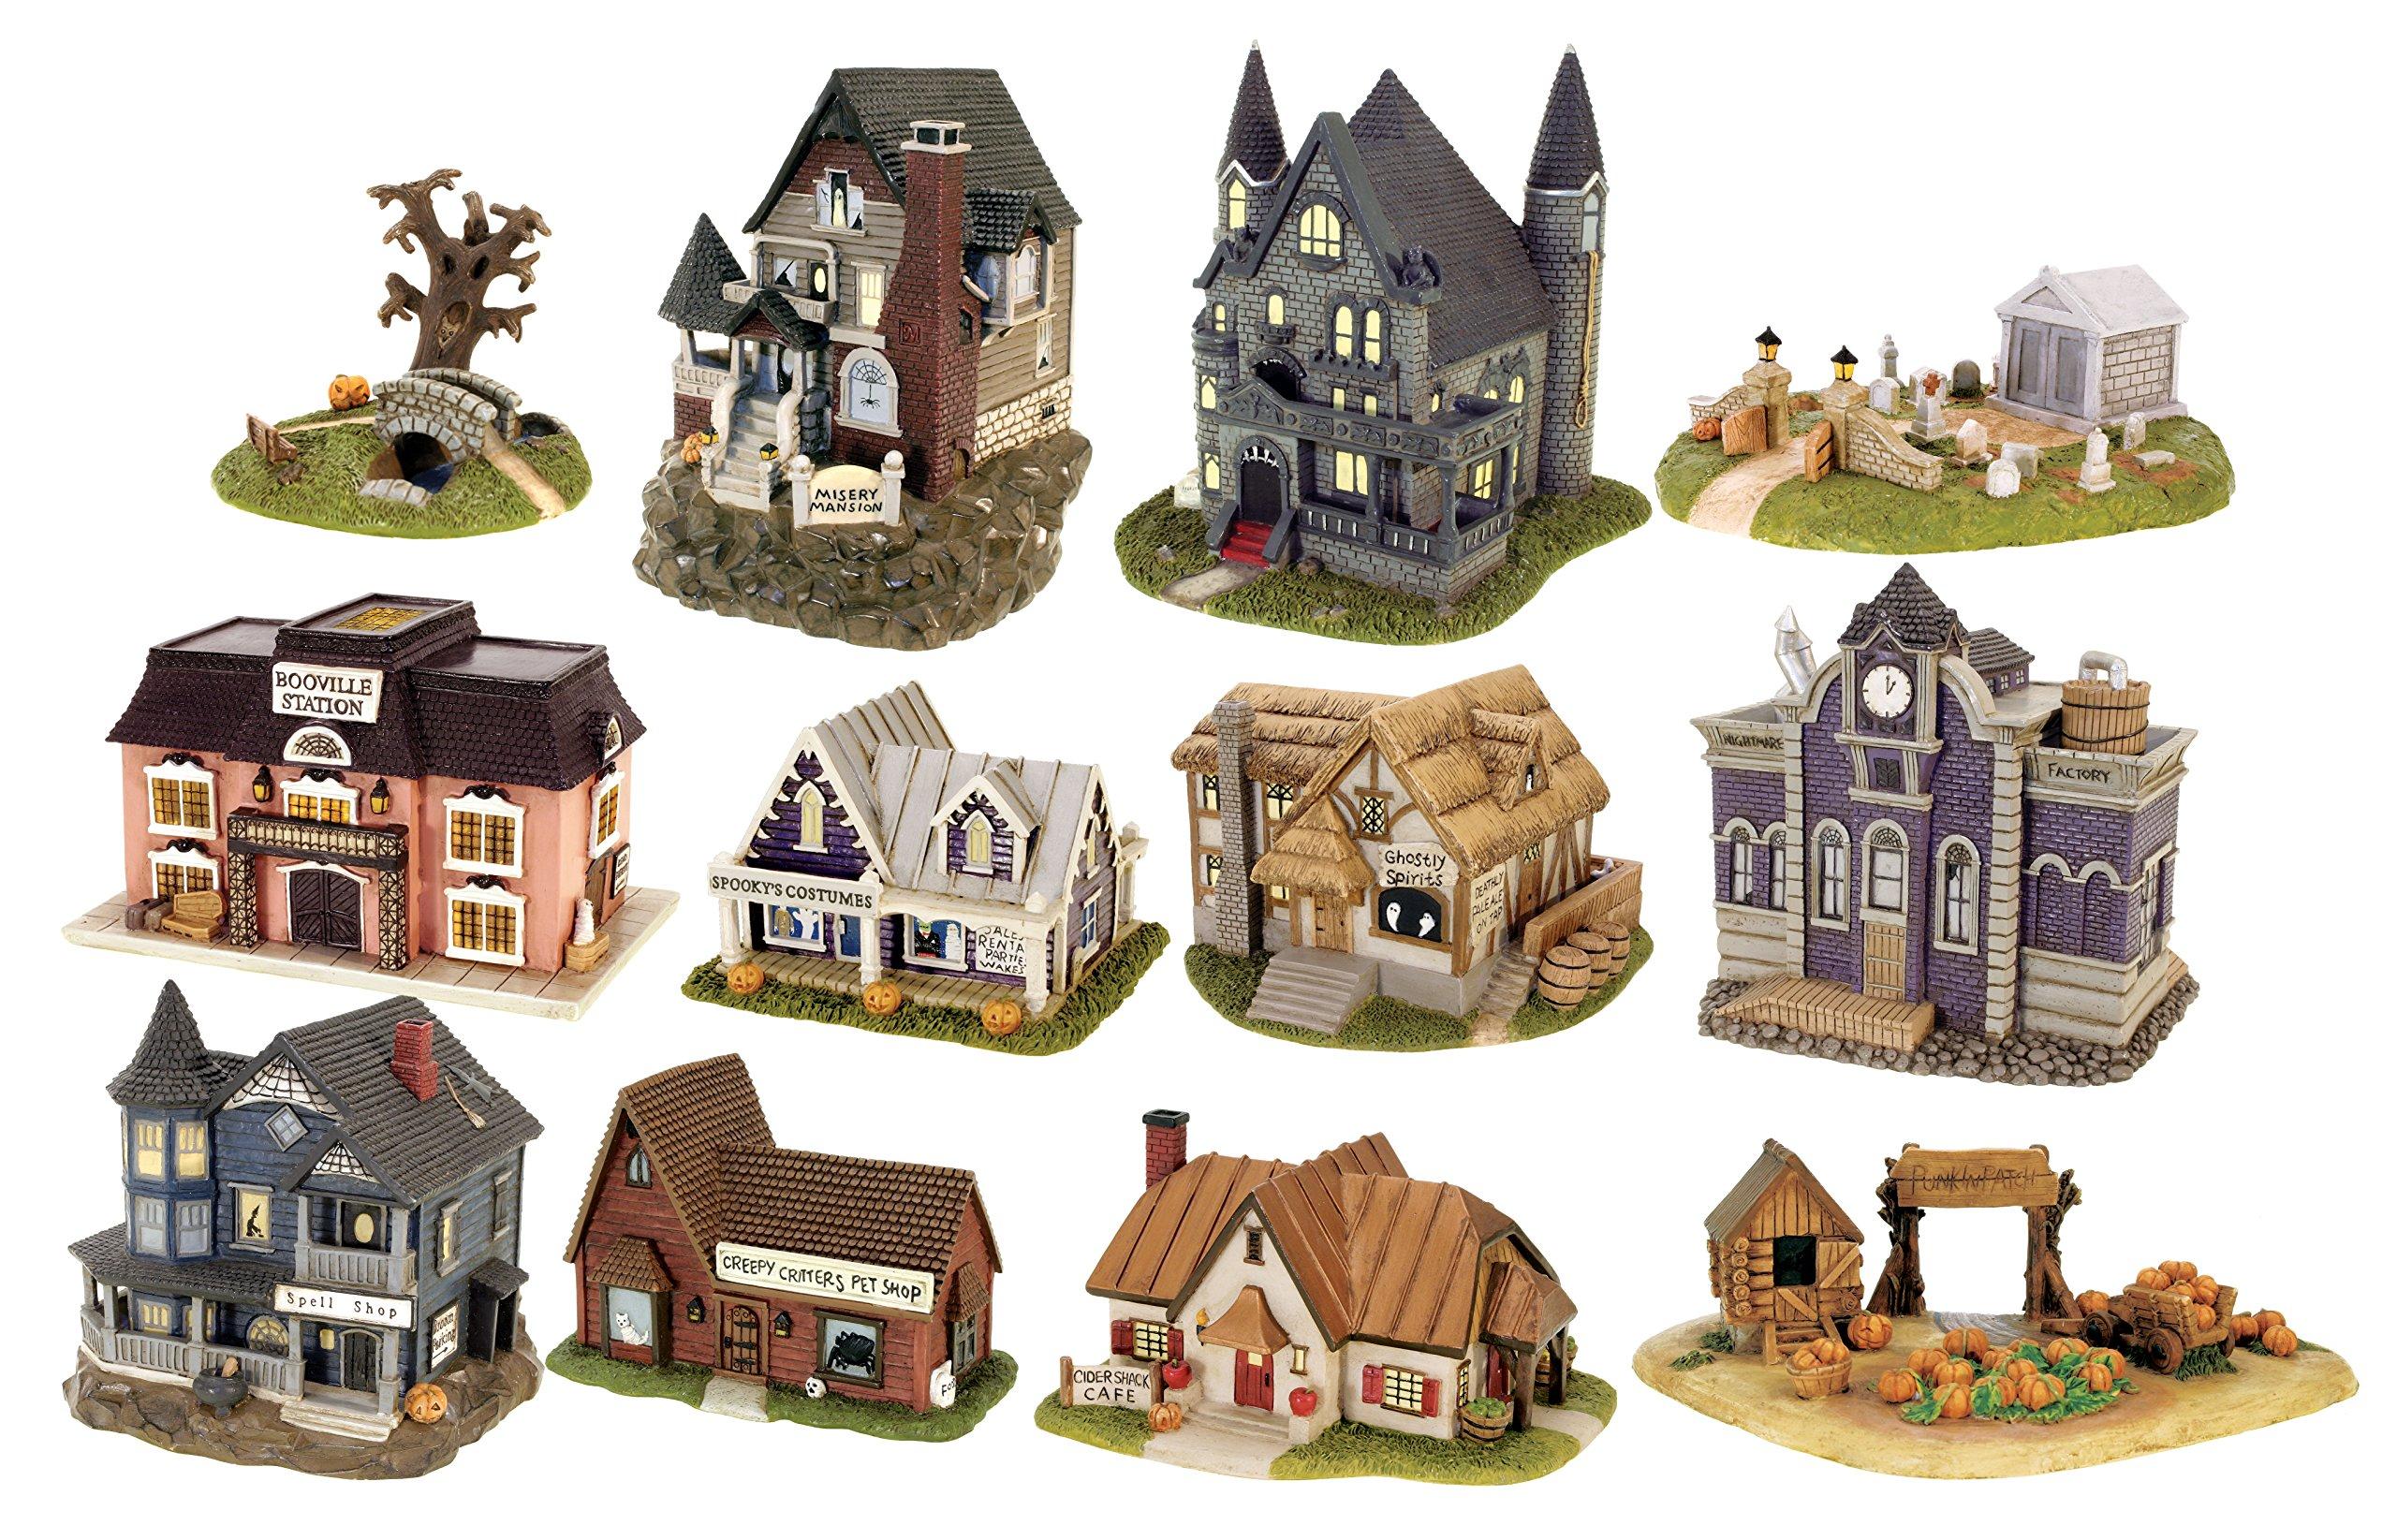 Micro-Trains Haunted Hamlet Village Halloween Indoor Decor Set of 12 Buildings